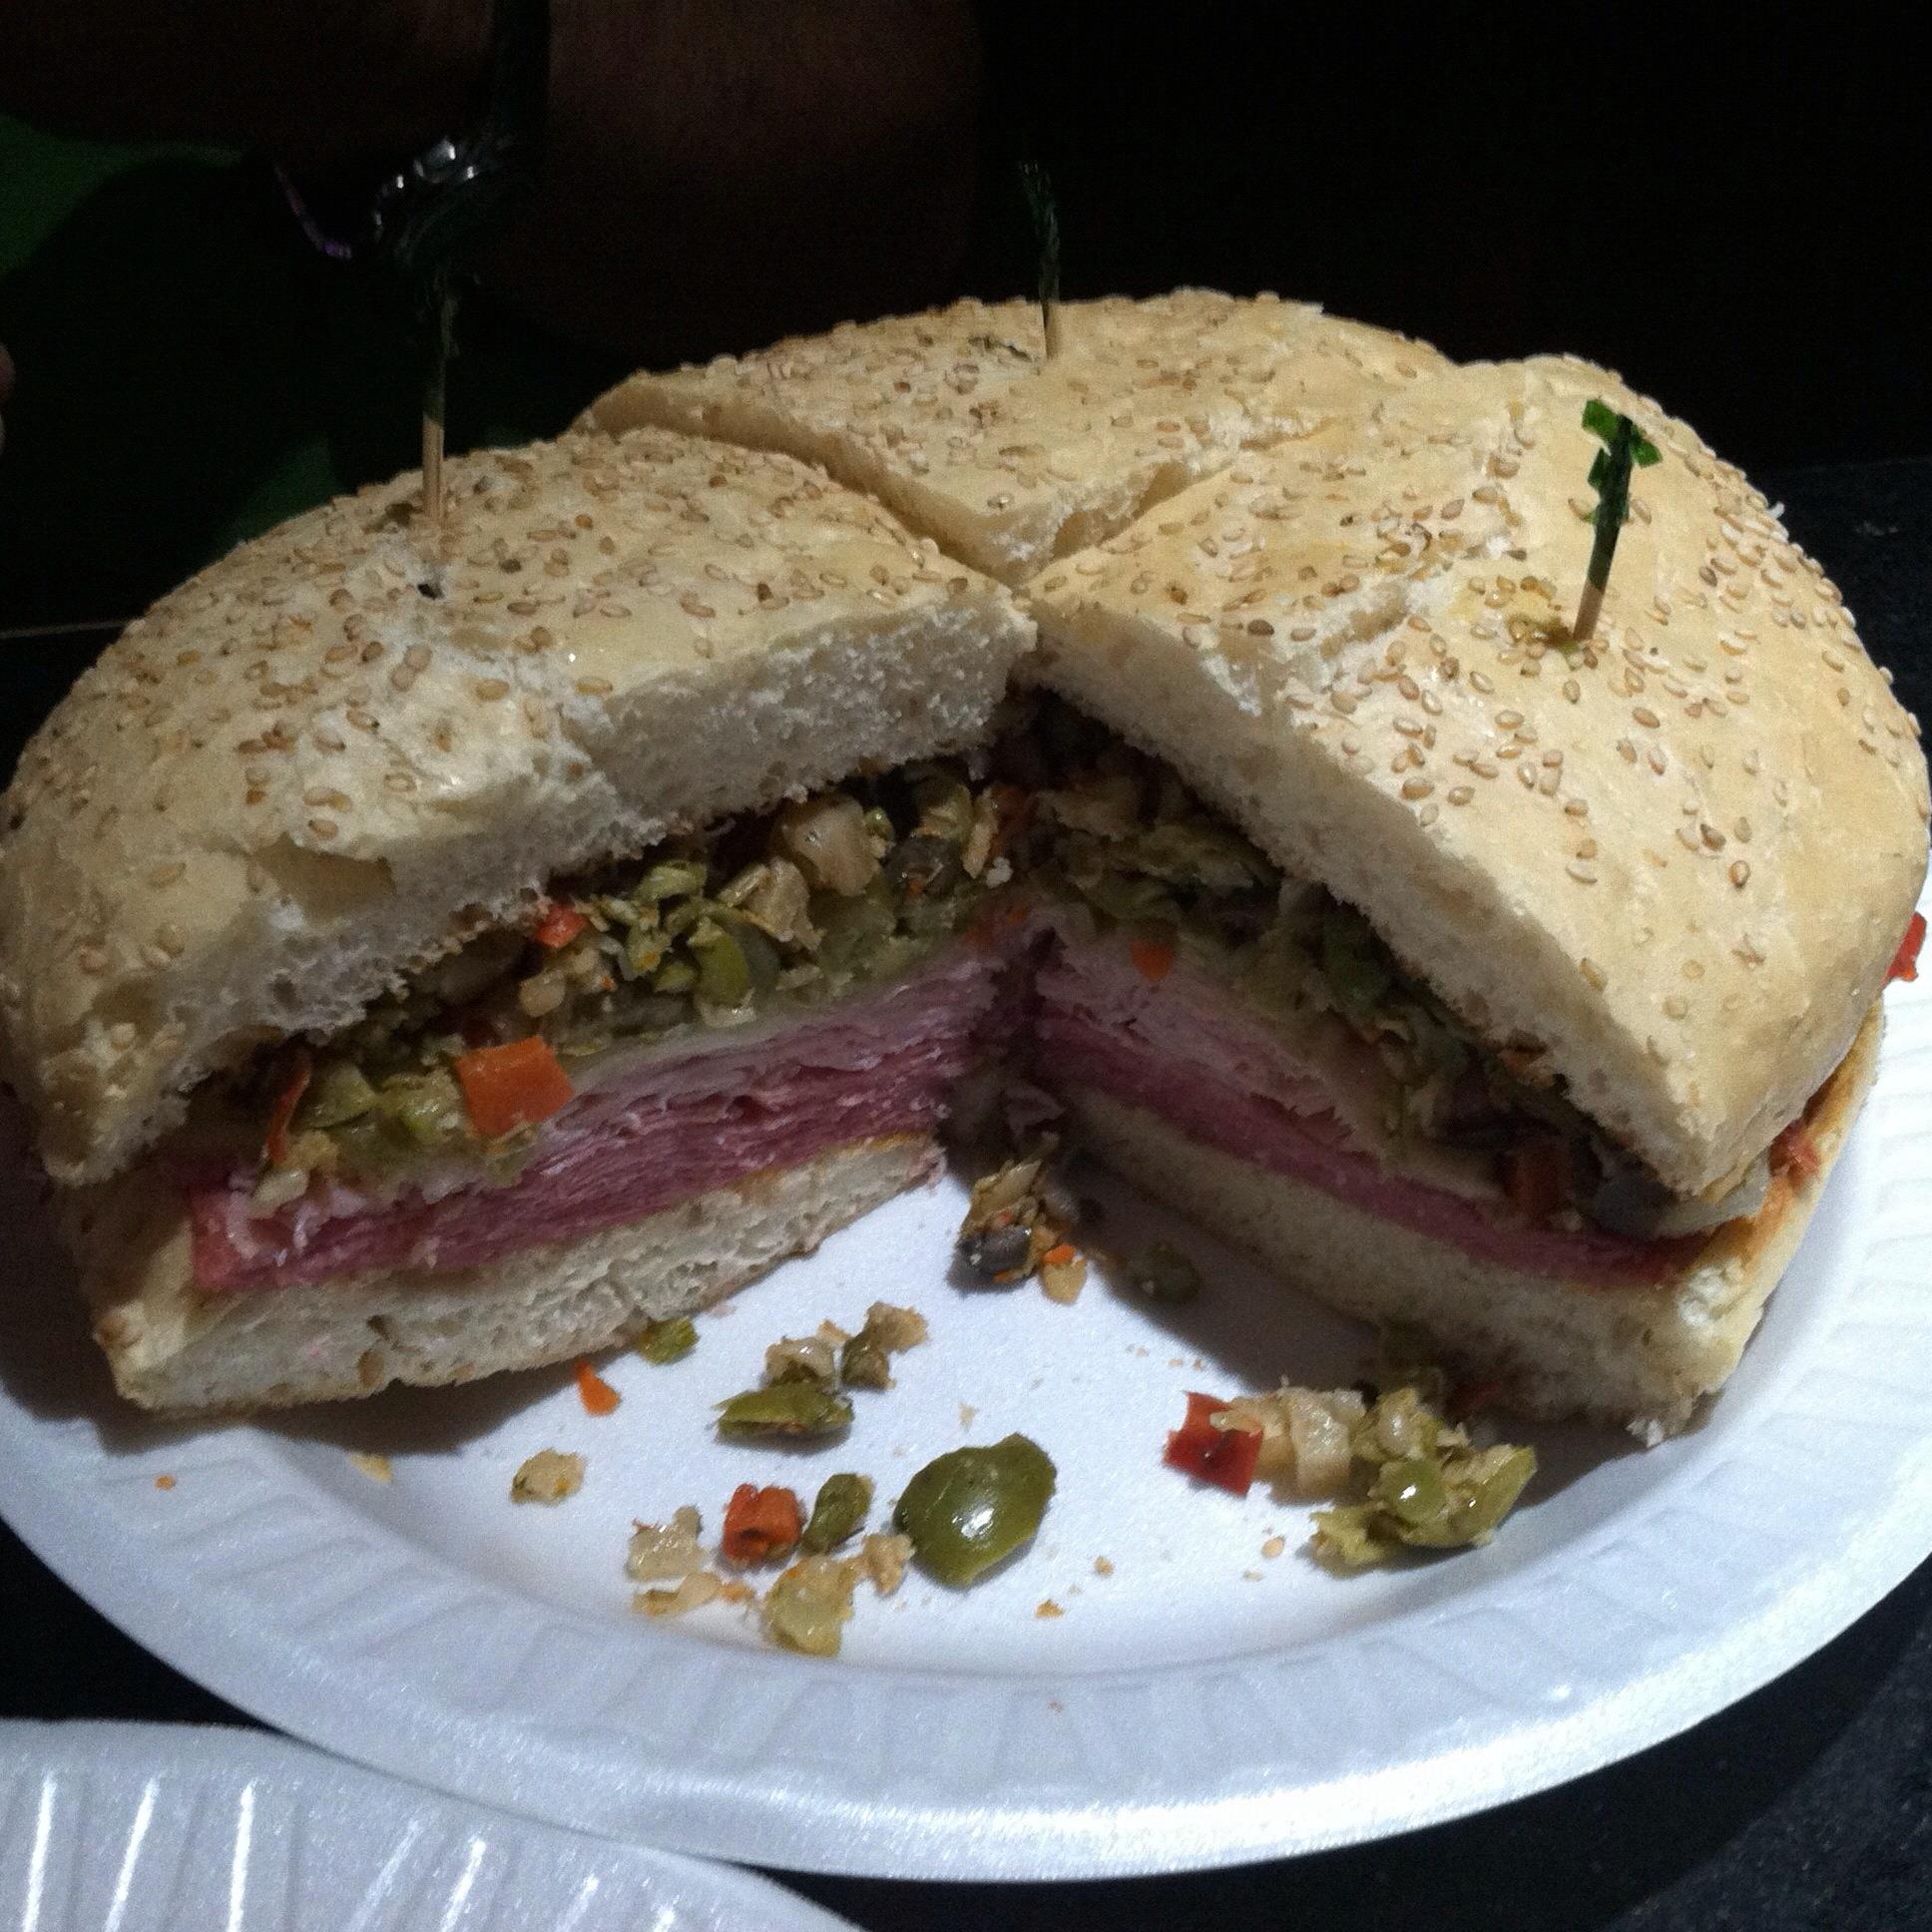 muffuletta sandwich - New Orleans, Louisiana: Central Grocery - Home of the Muffuletta